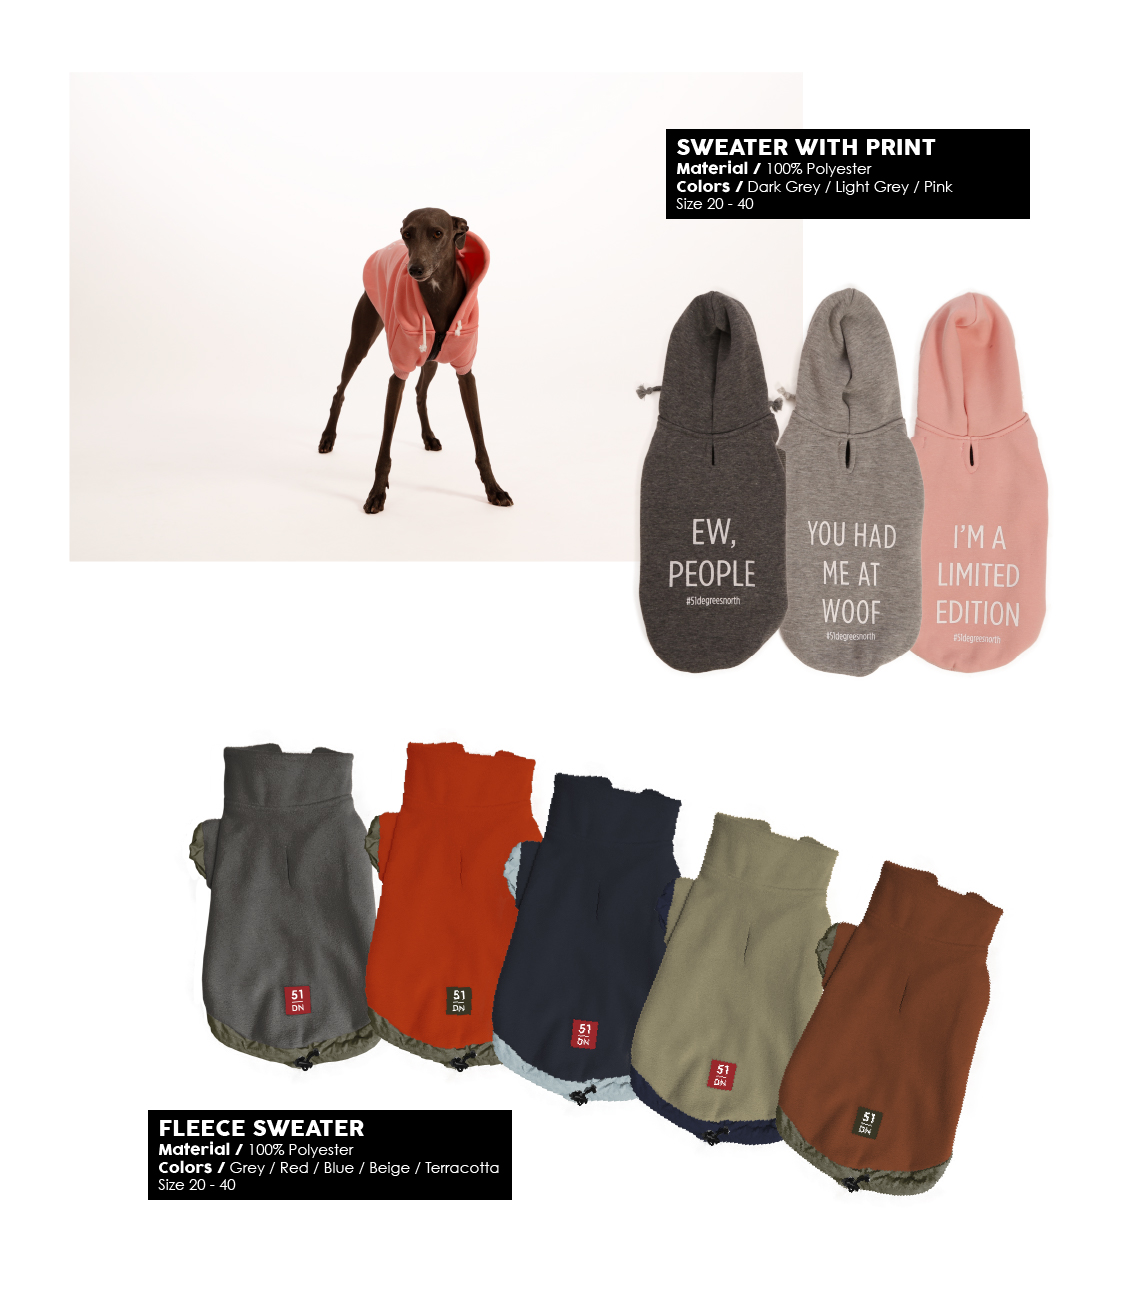 W20 - Dogcoats - Sweater print - Fleece